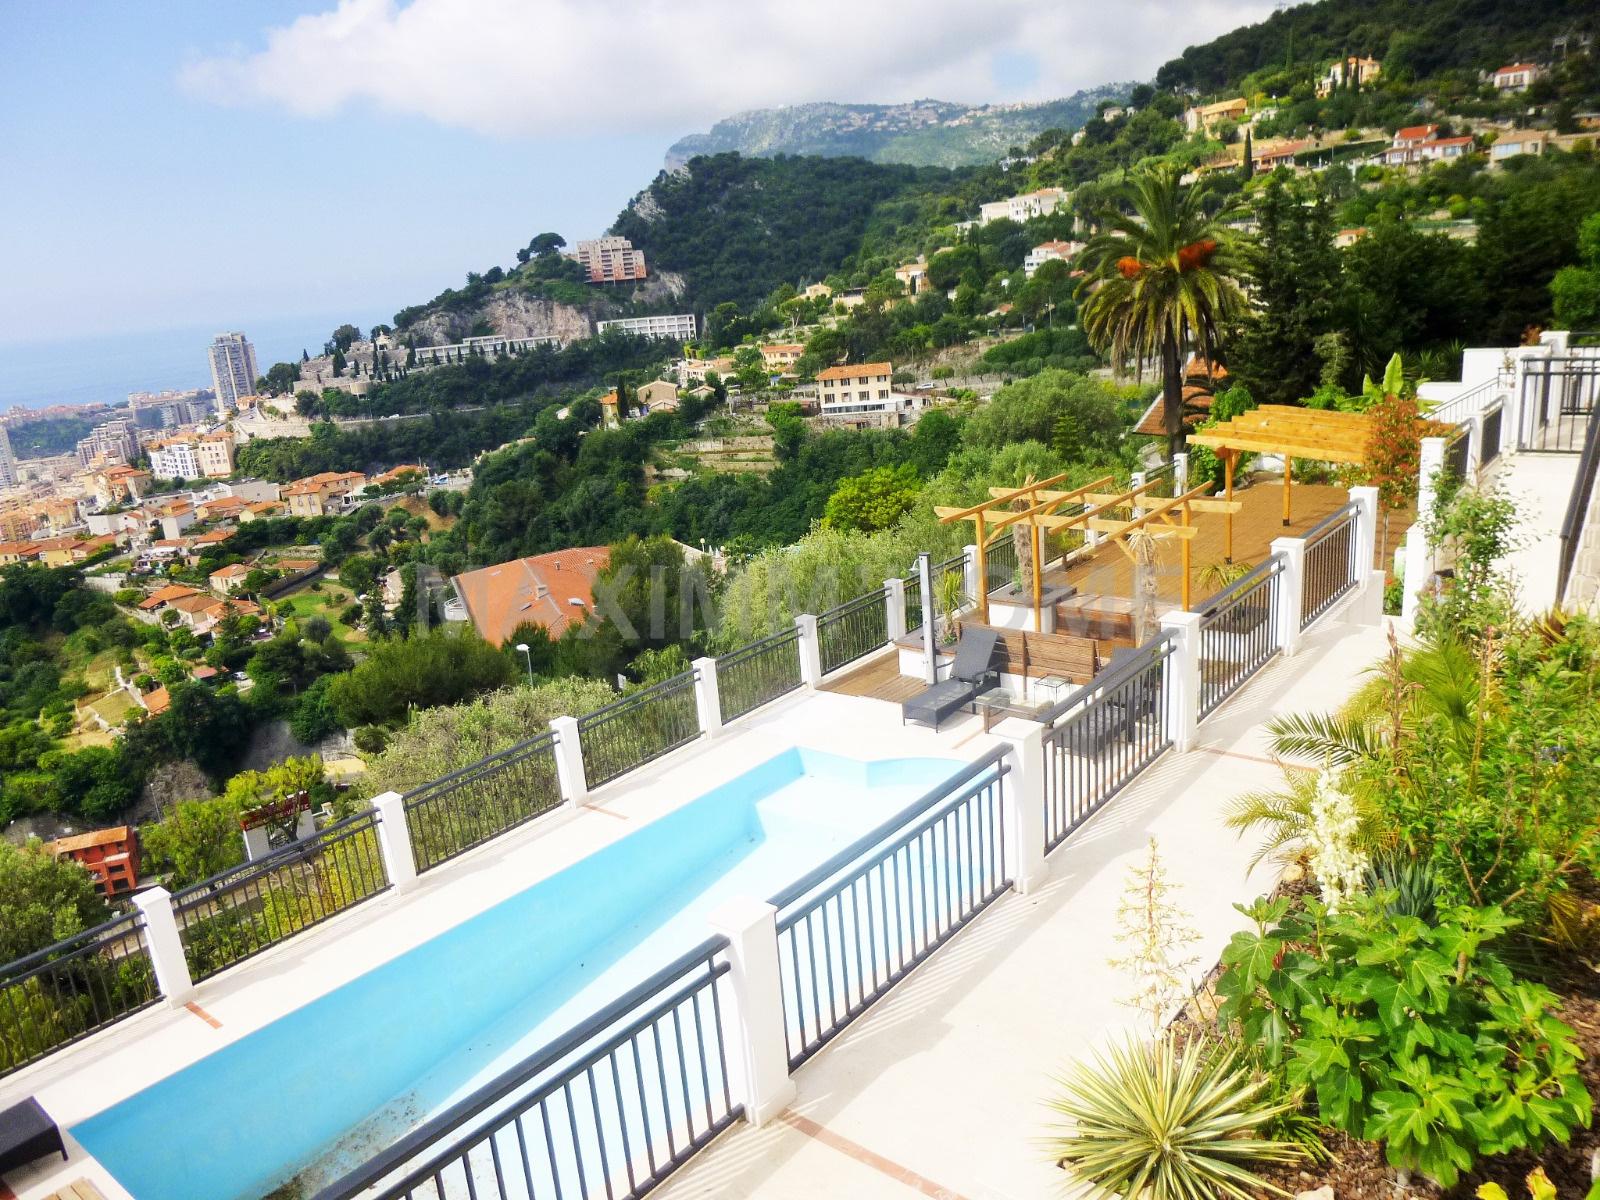 Vente maison villa roquebrune cap martin avec maximm home for Acheter maison monaco